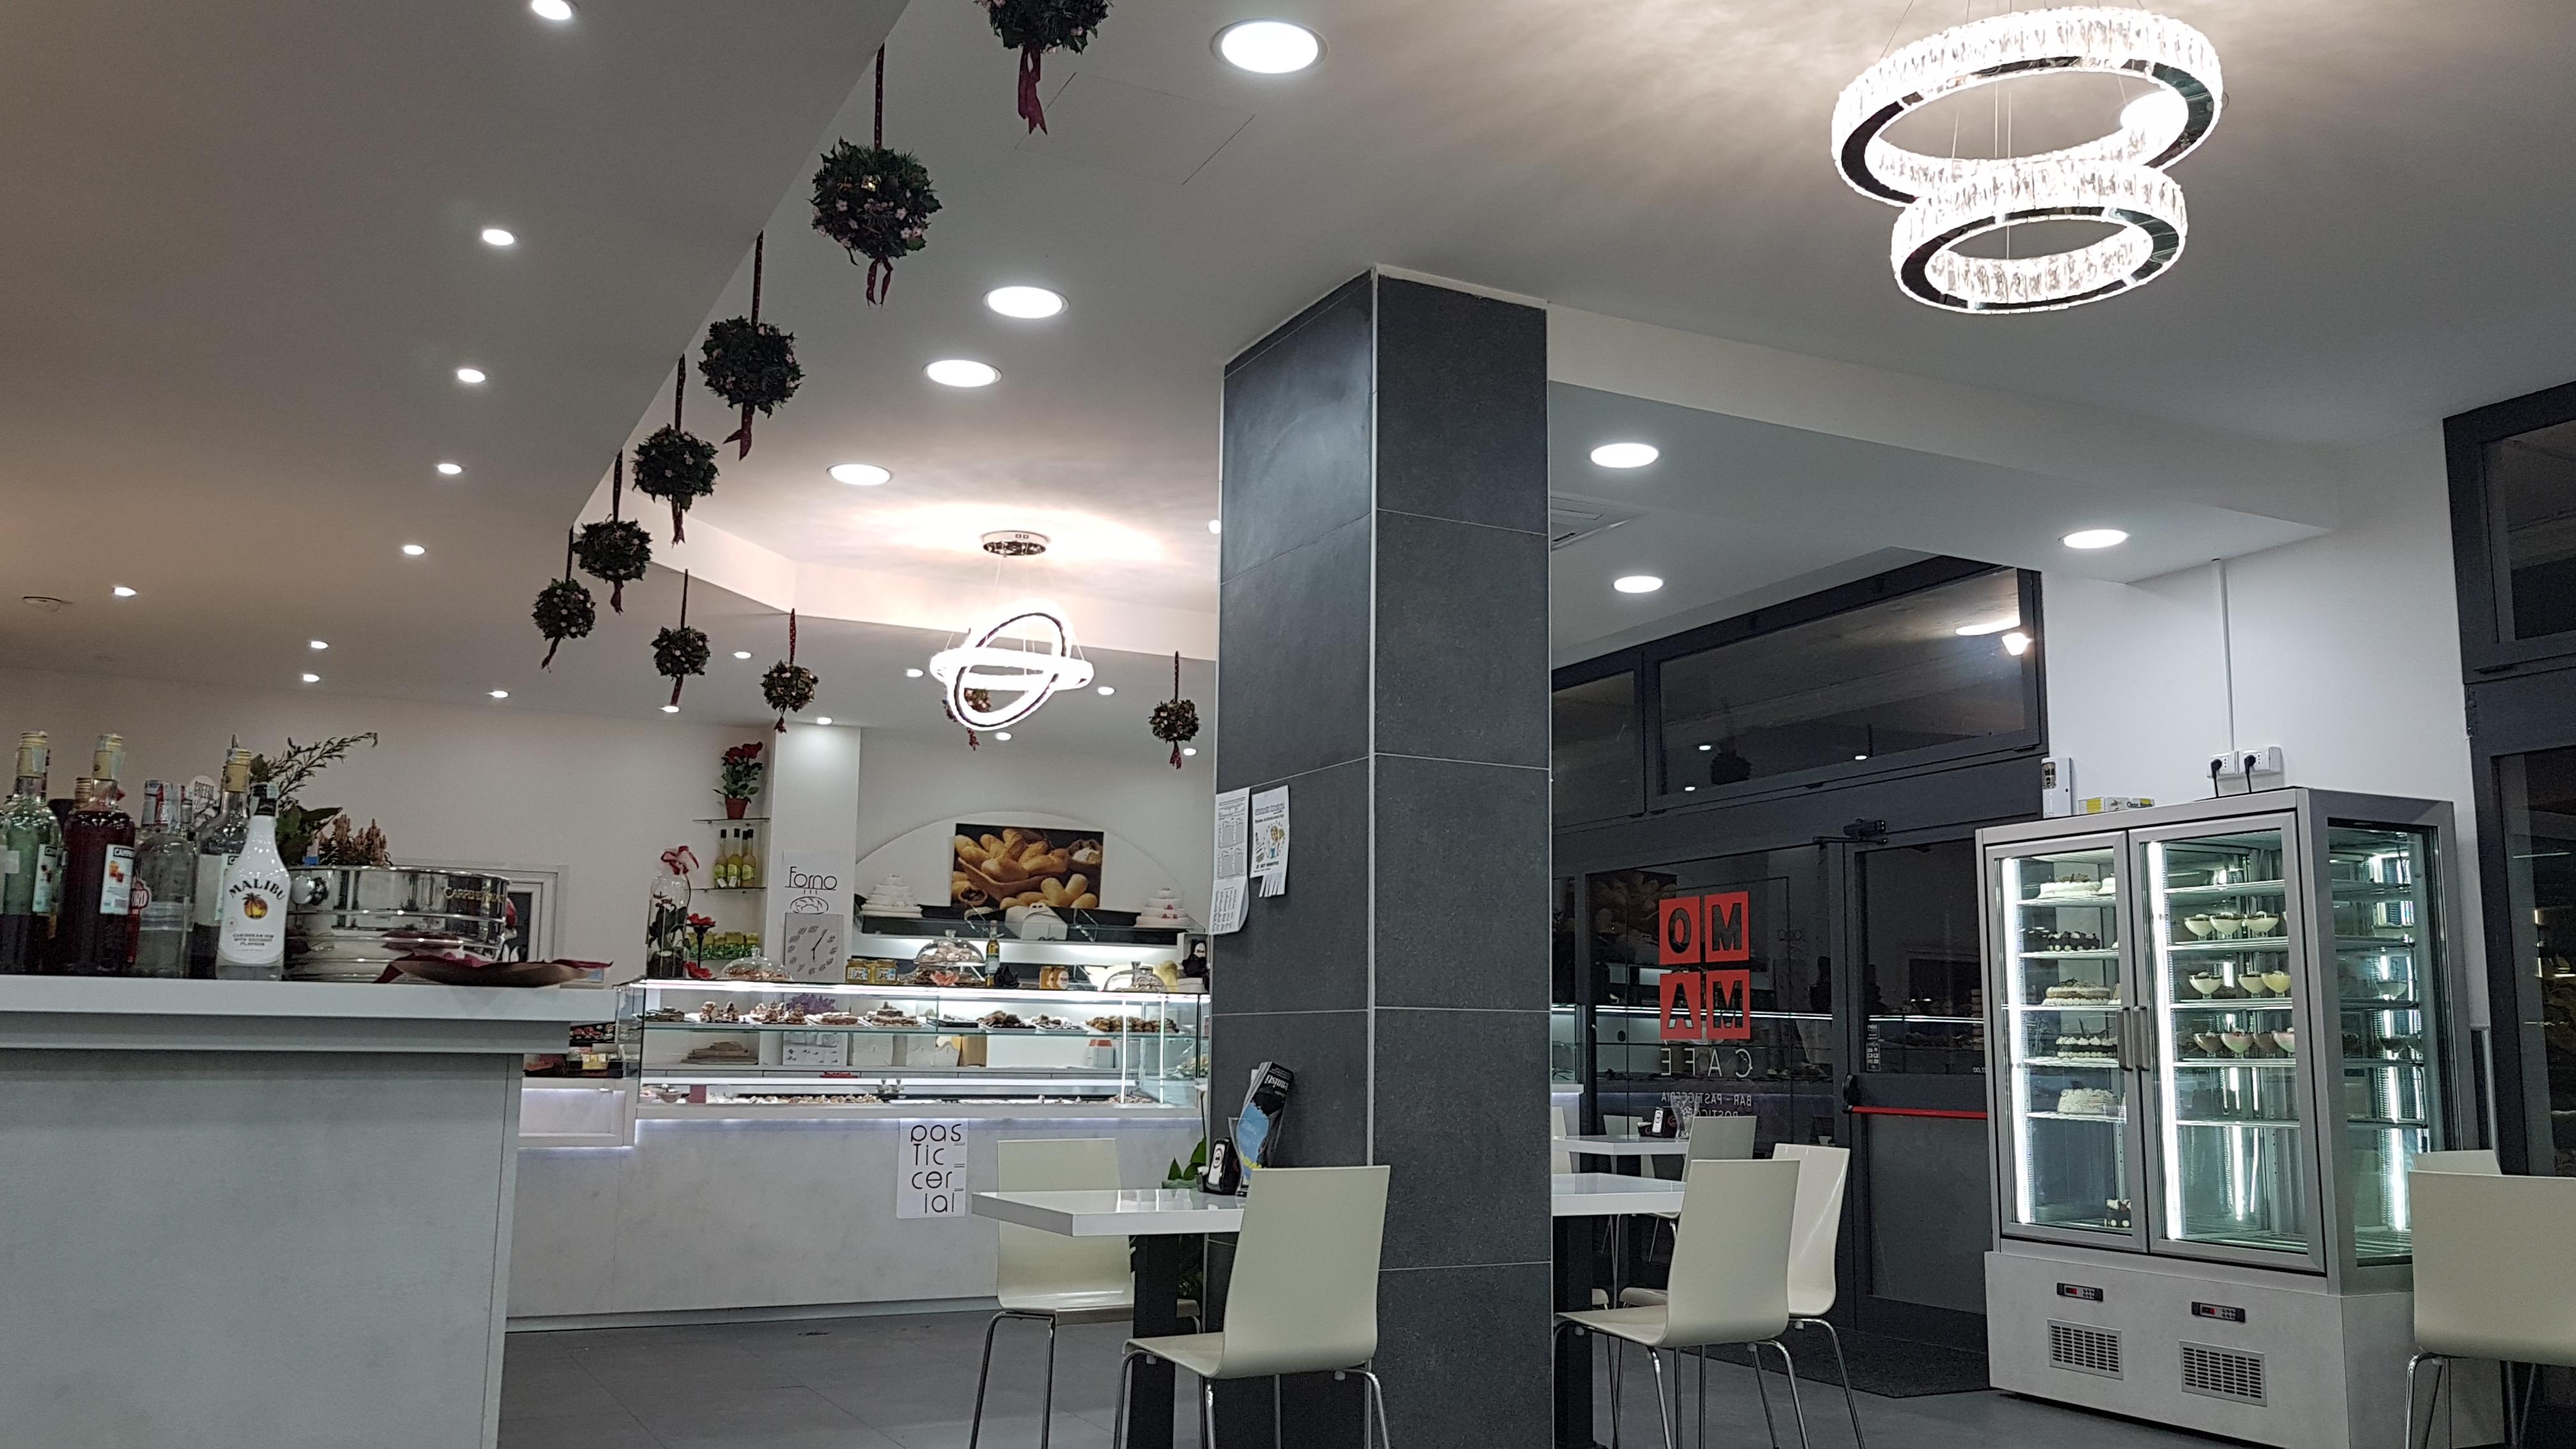 MOMA CAFFE PASTICCERIA  ROSTICCERIA  PANETTERIA  TAVOLA CALDA 2jpg